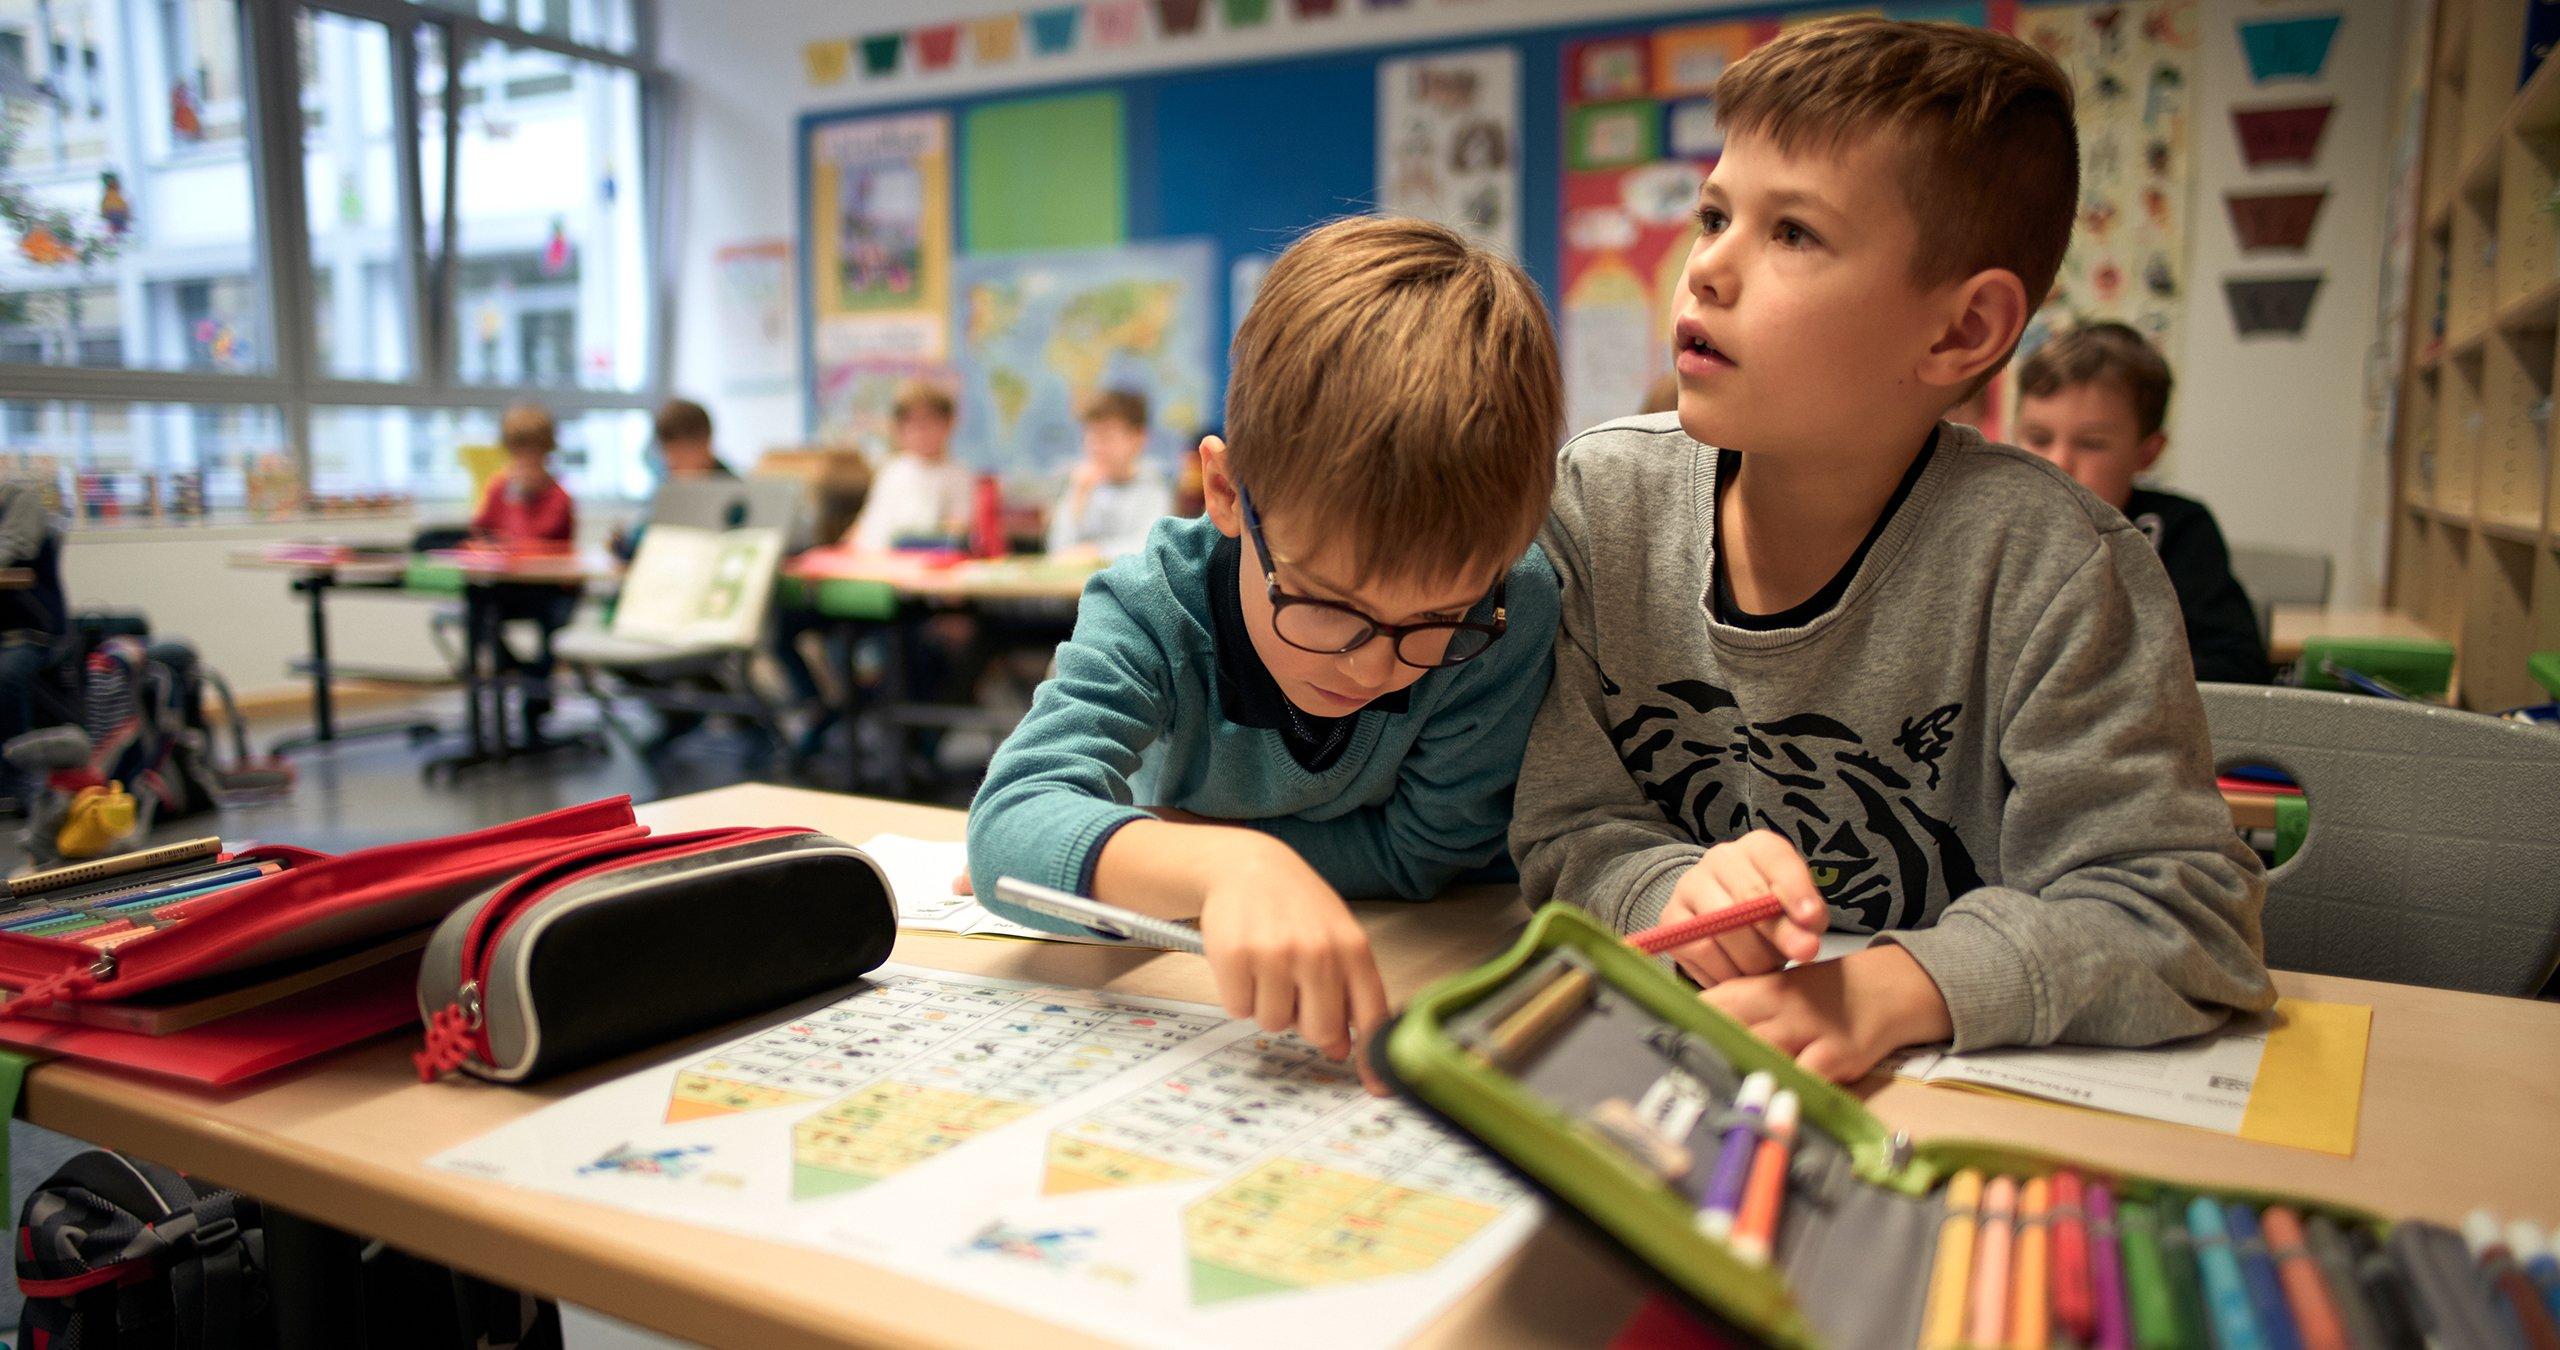 Schuleinschreibung Grundschule 2021